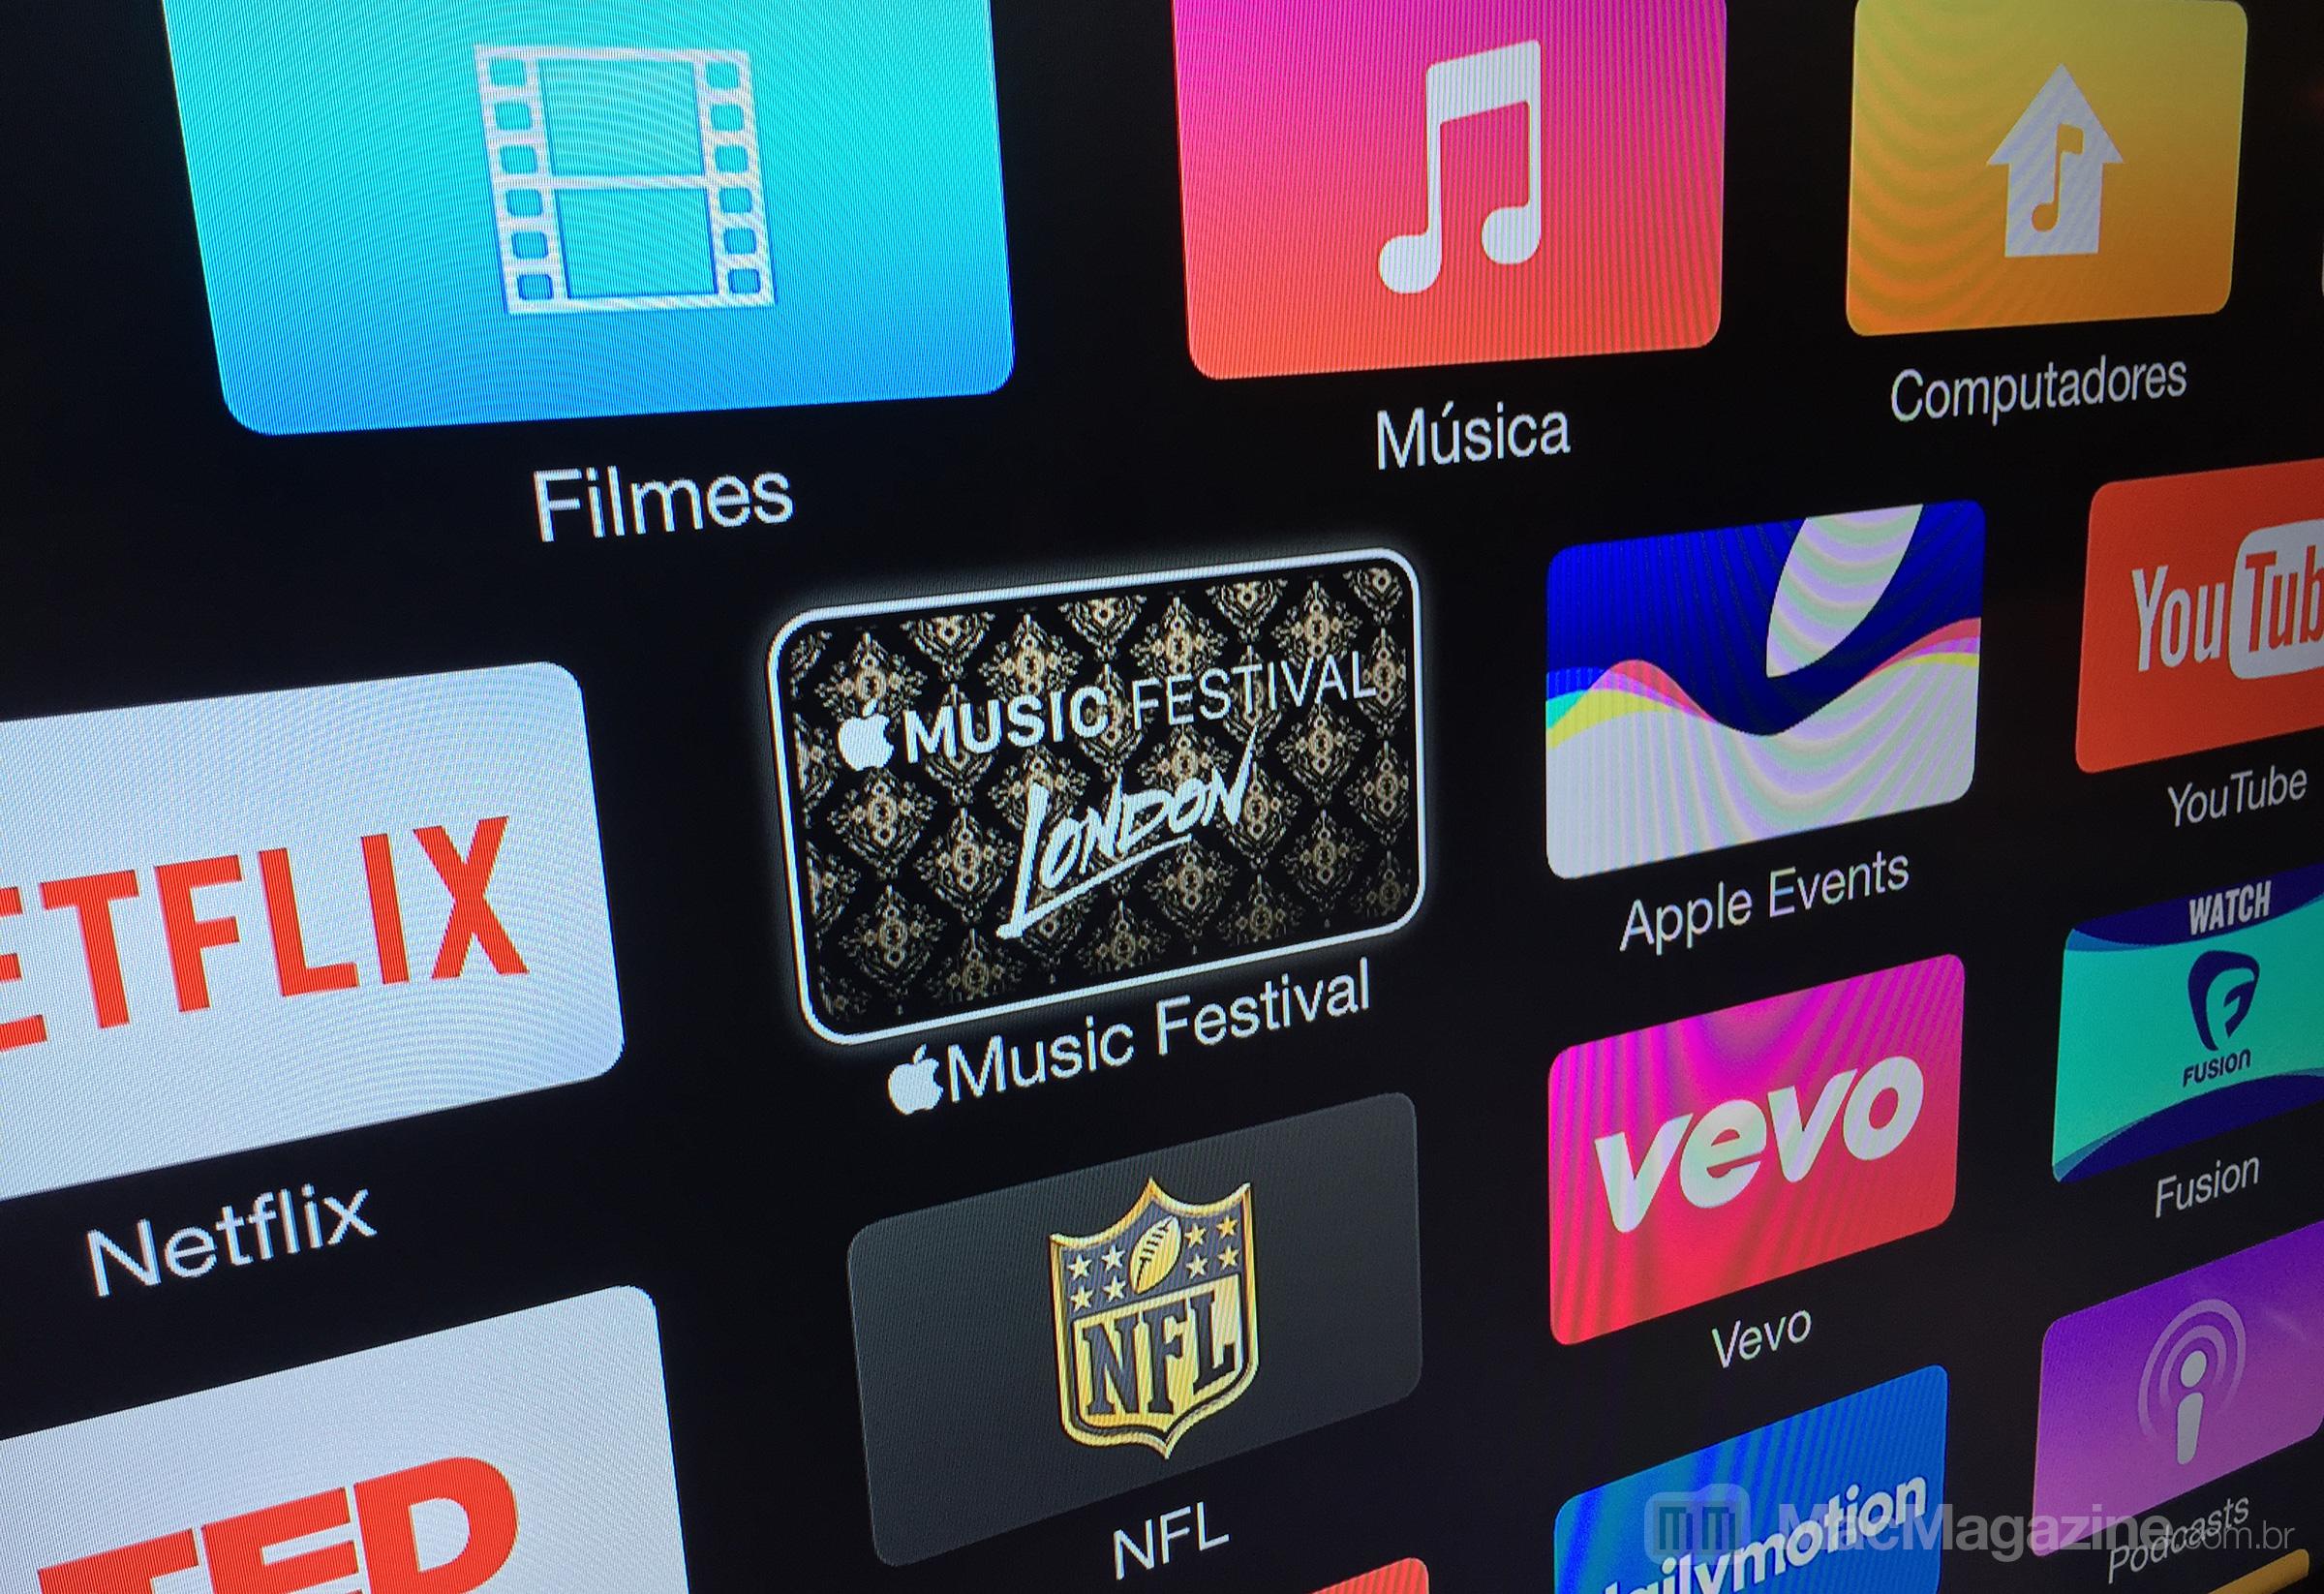 Canal do Apple Music Festival na Apple TV